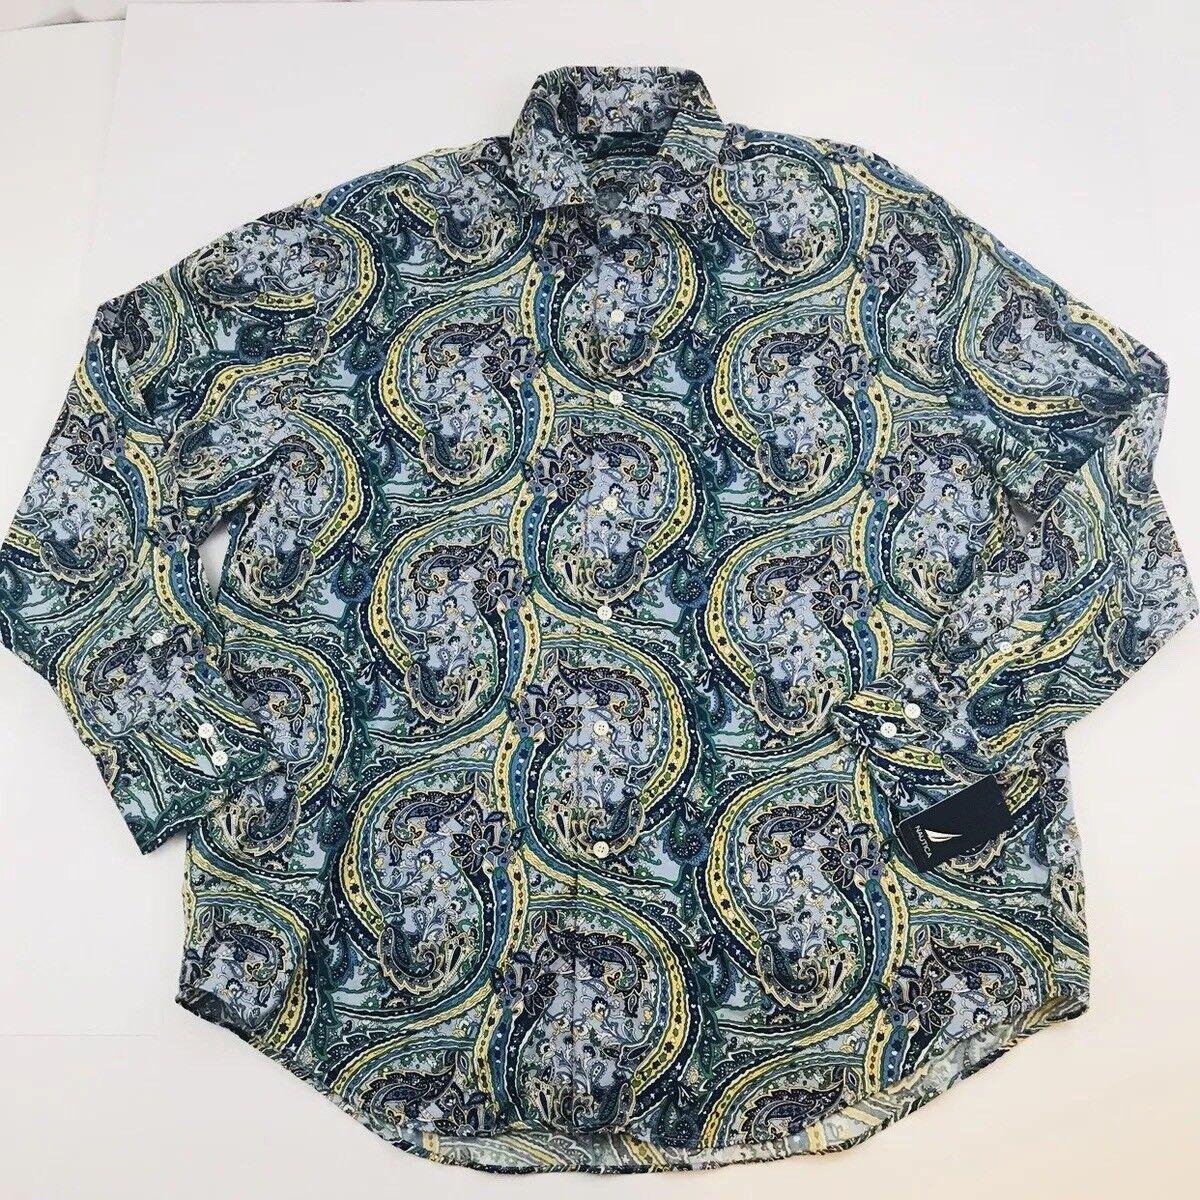 Nautica Mens XL Dress Shirt button front collared Floral paisley Design  (209)